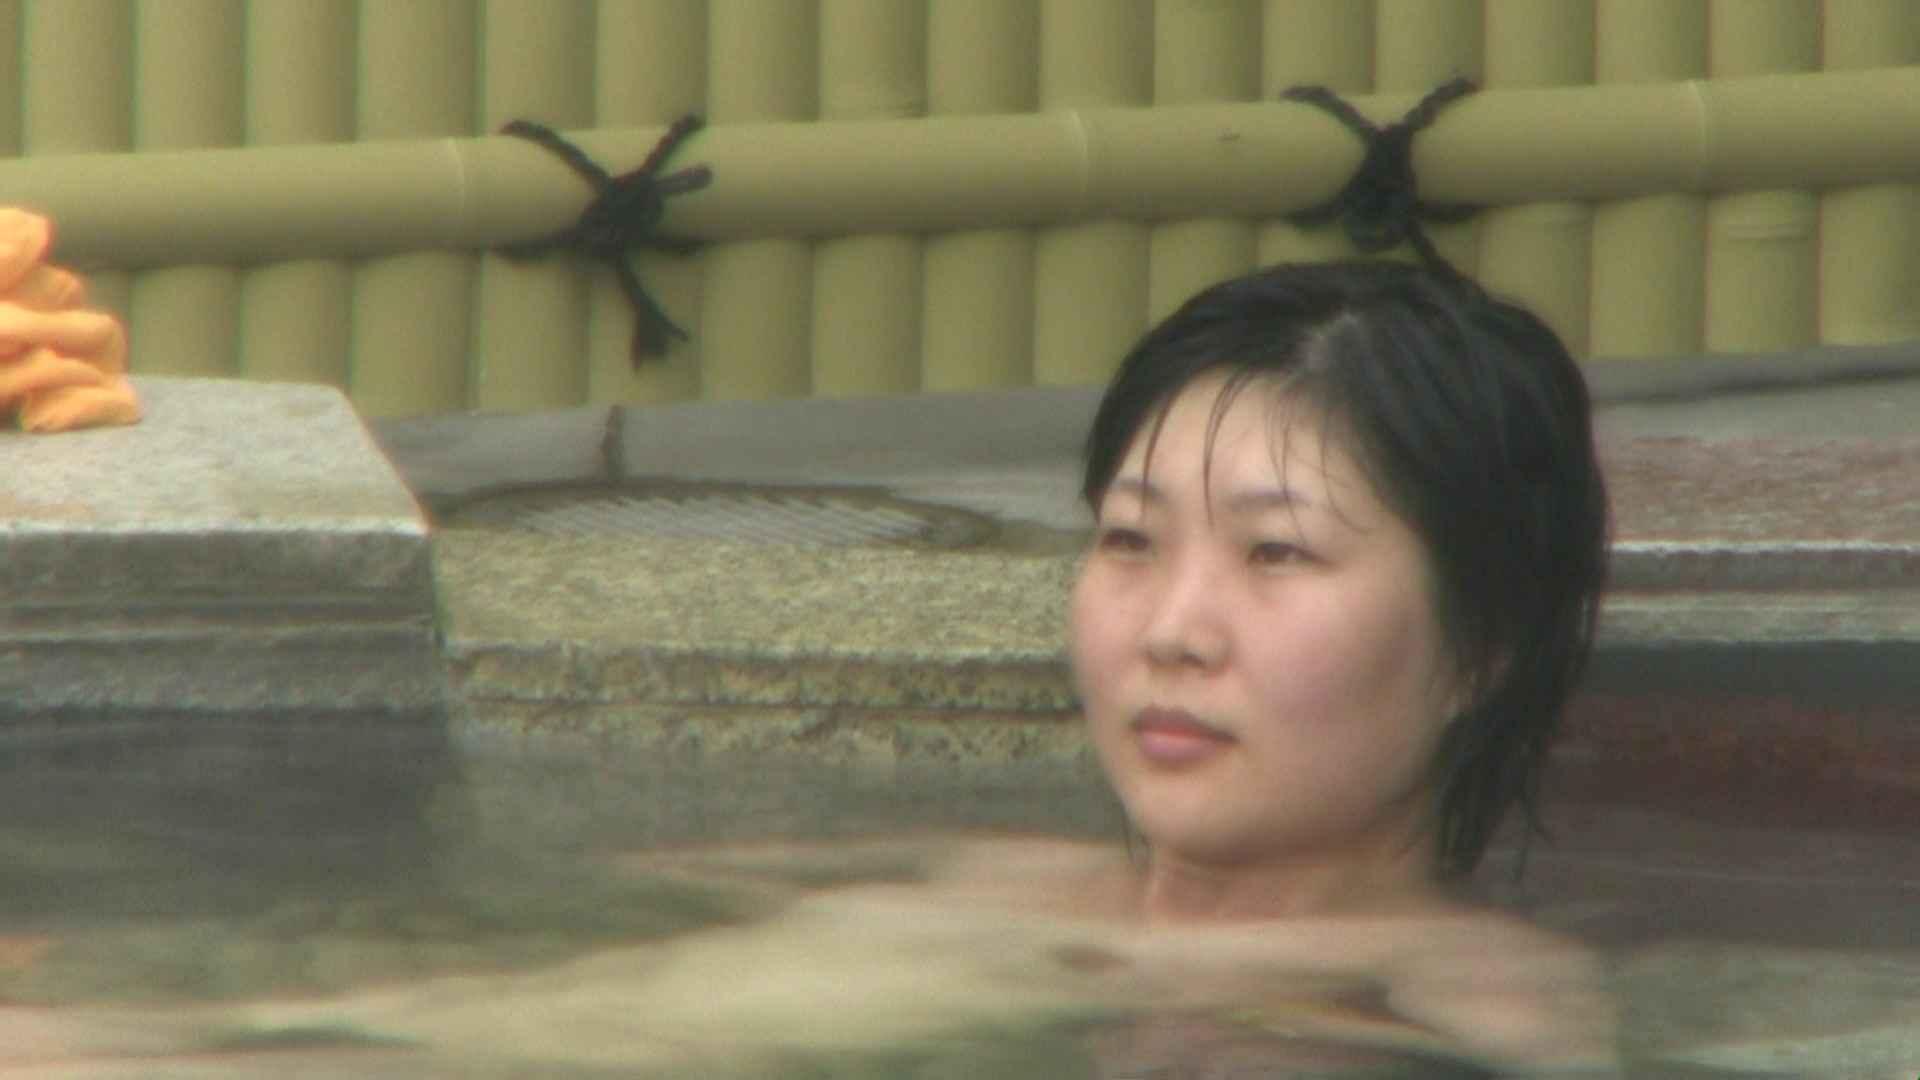 Aquaな露天風呂Vol.75【VIP限定】 露天風呂編 | 盗撮シリーズ  99PIX 9